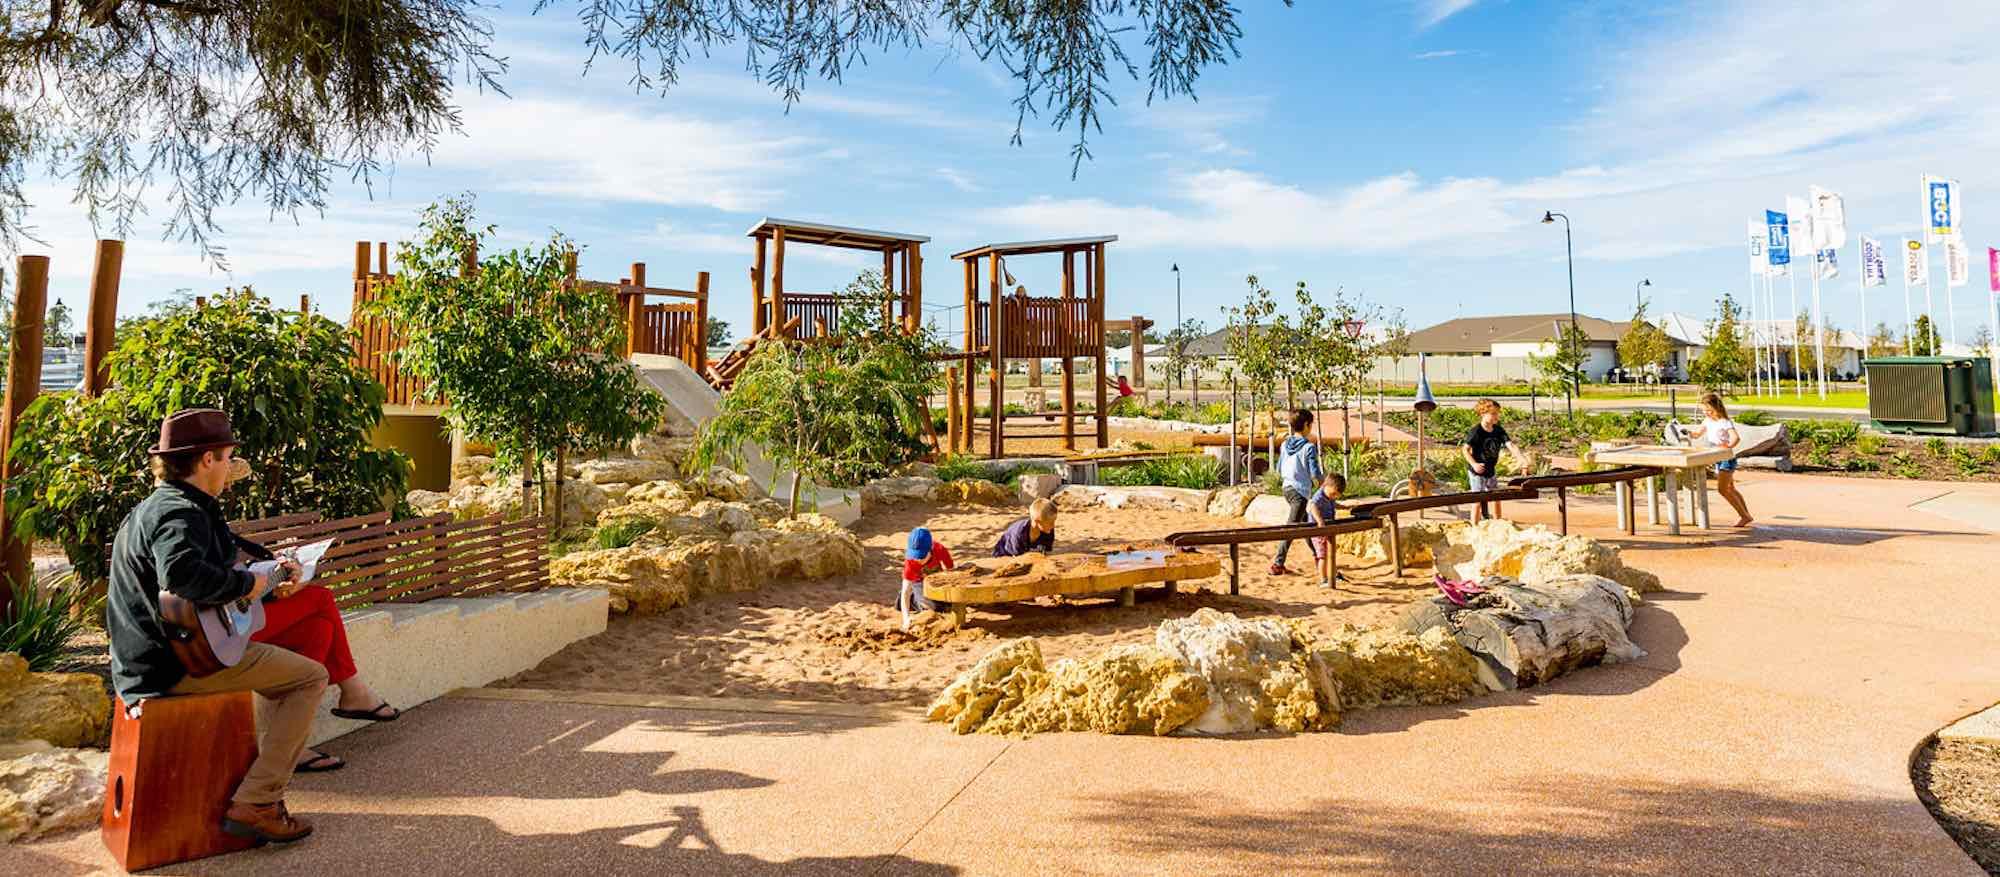 vasse-nature-play-park-water-cubby-logs-guitar